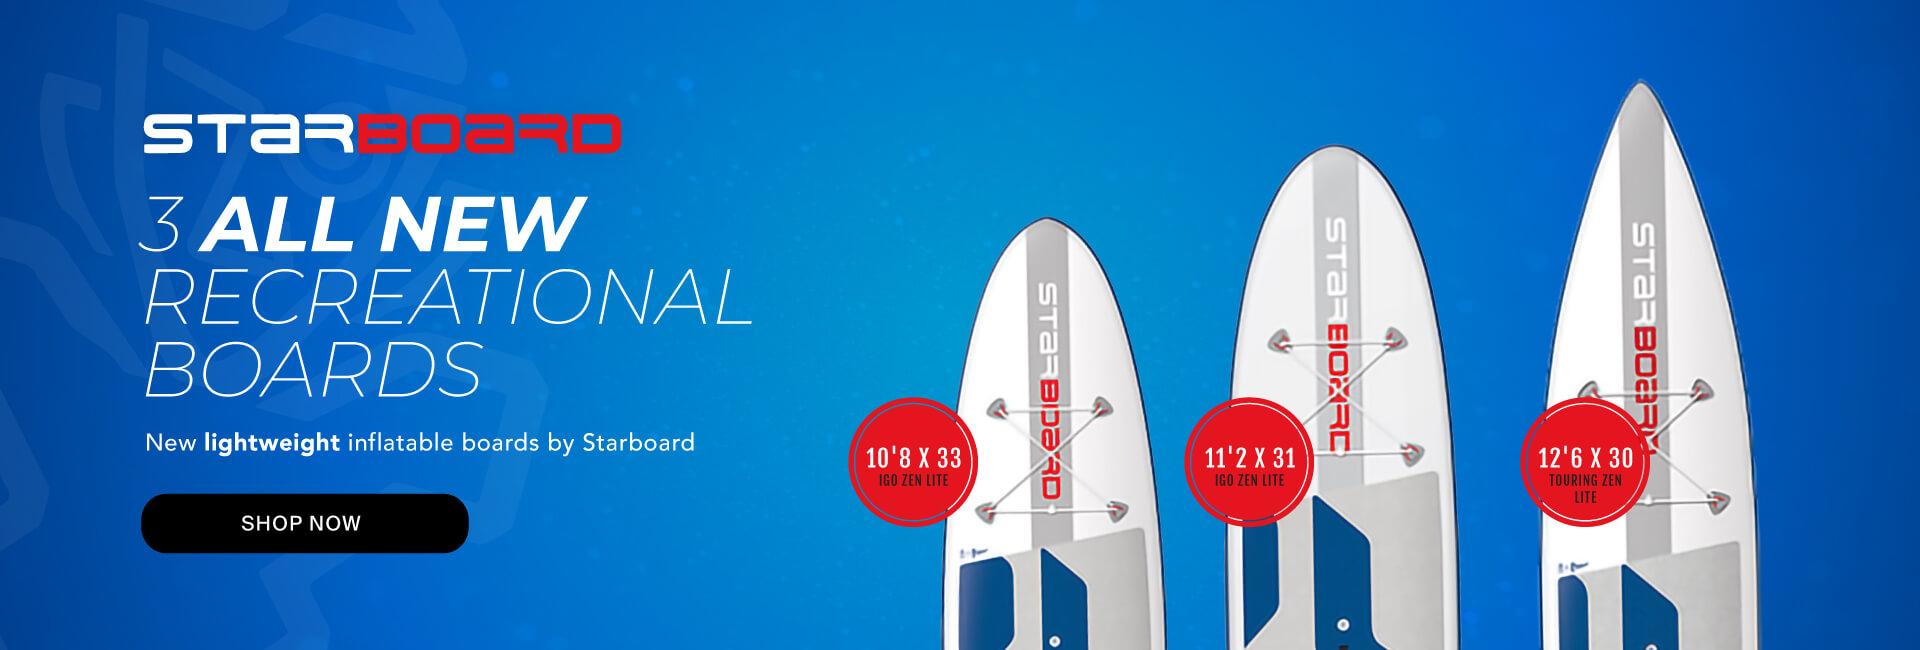 2019 Starboard Lightweight Recreational Boards